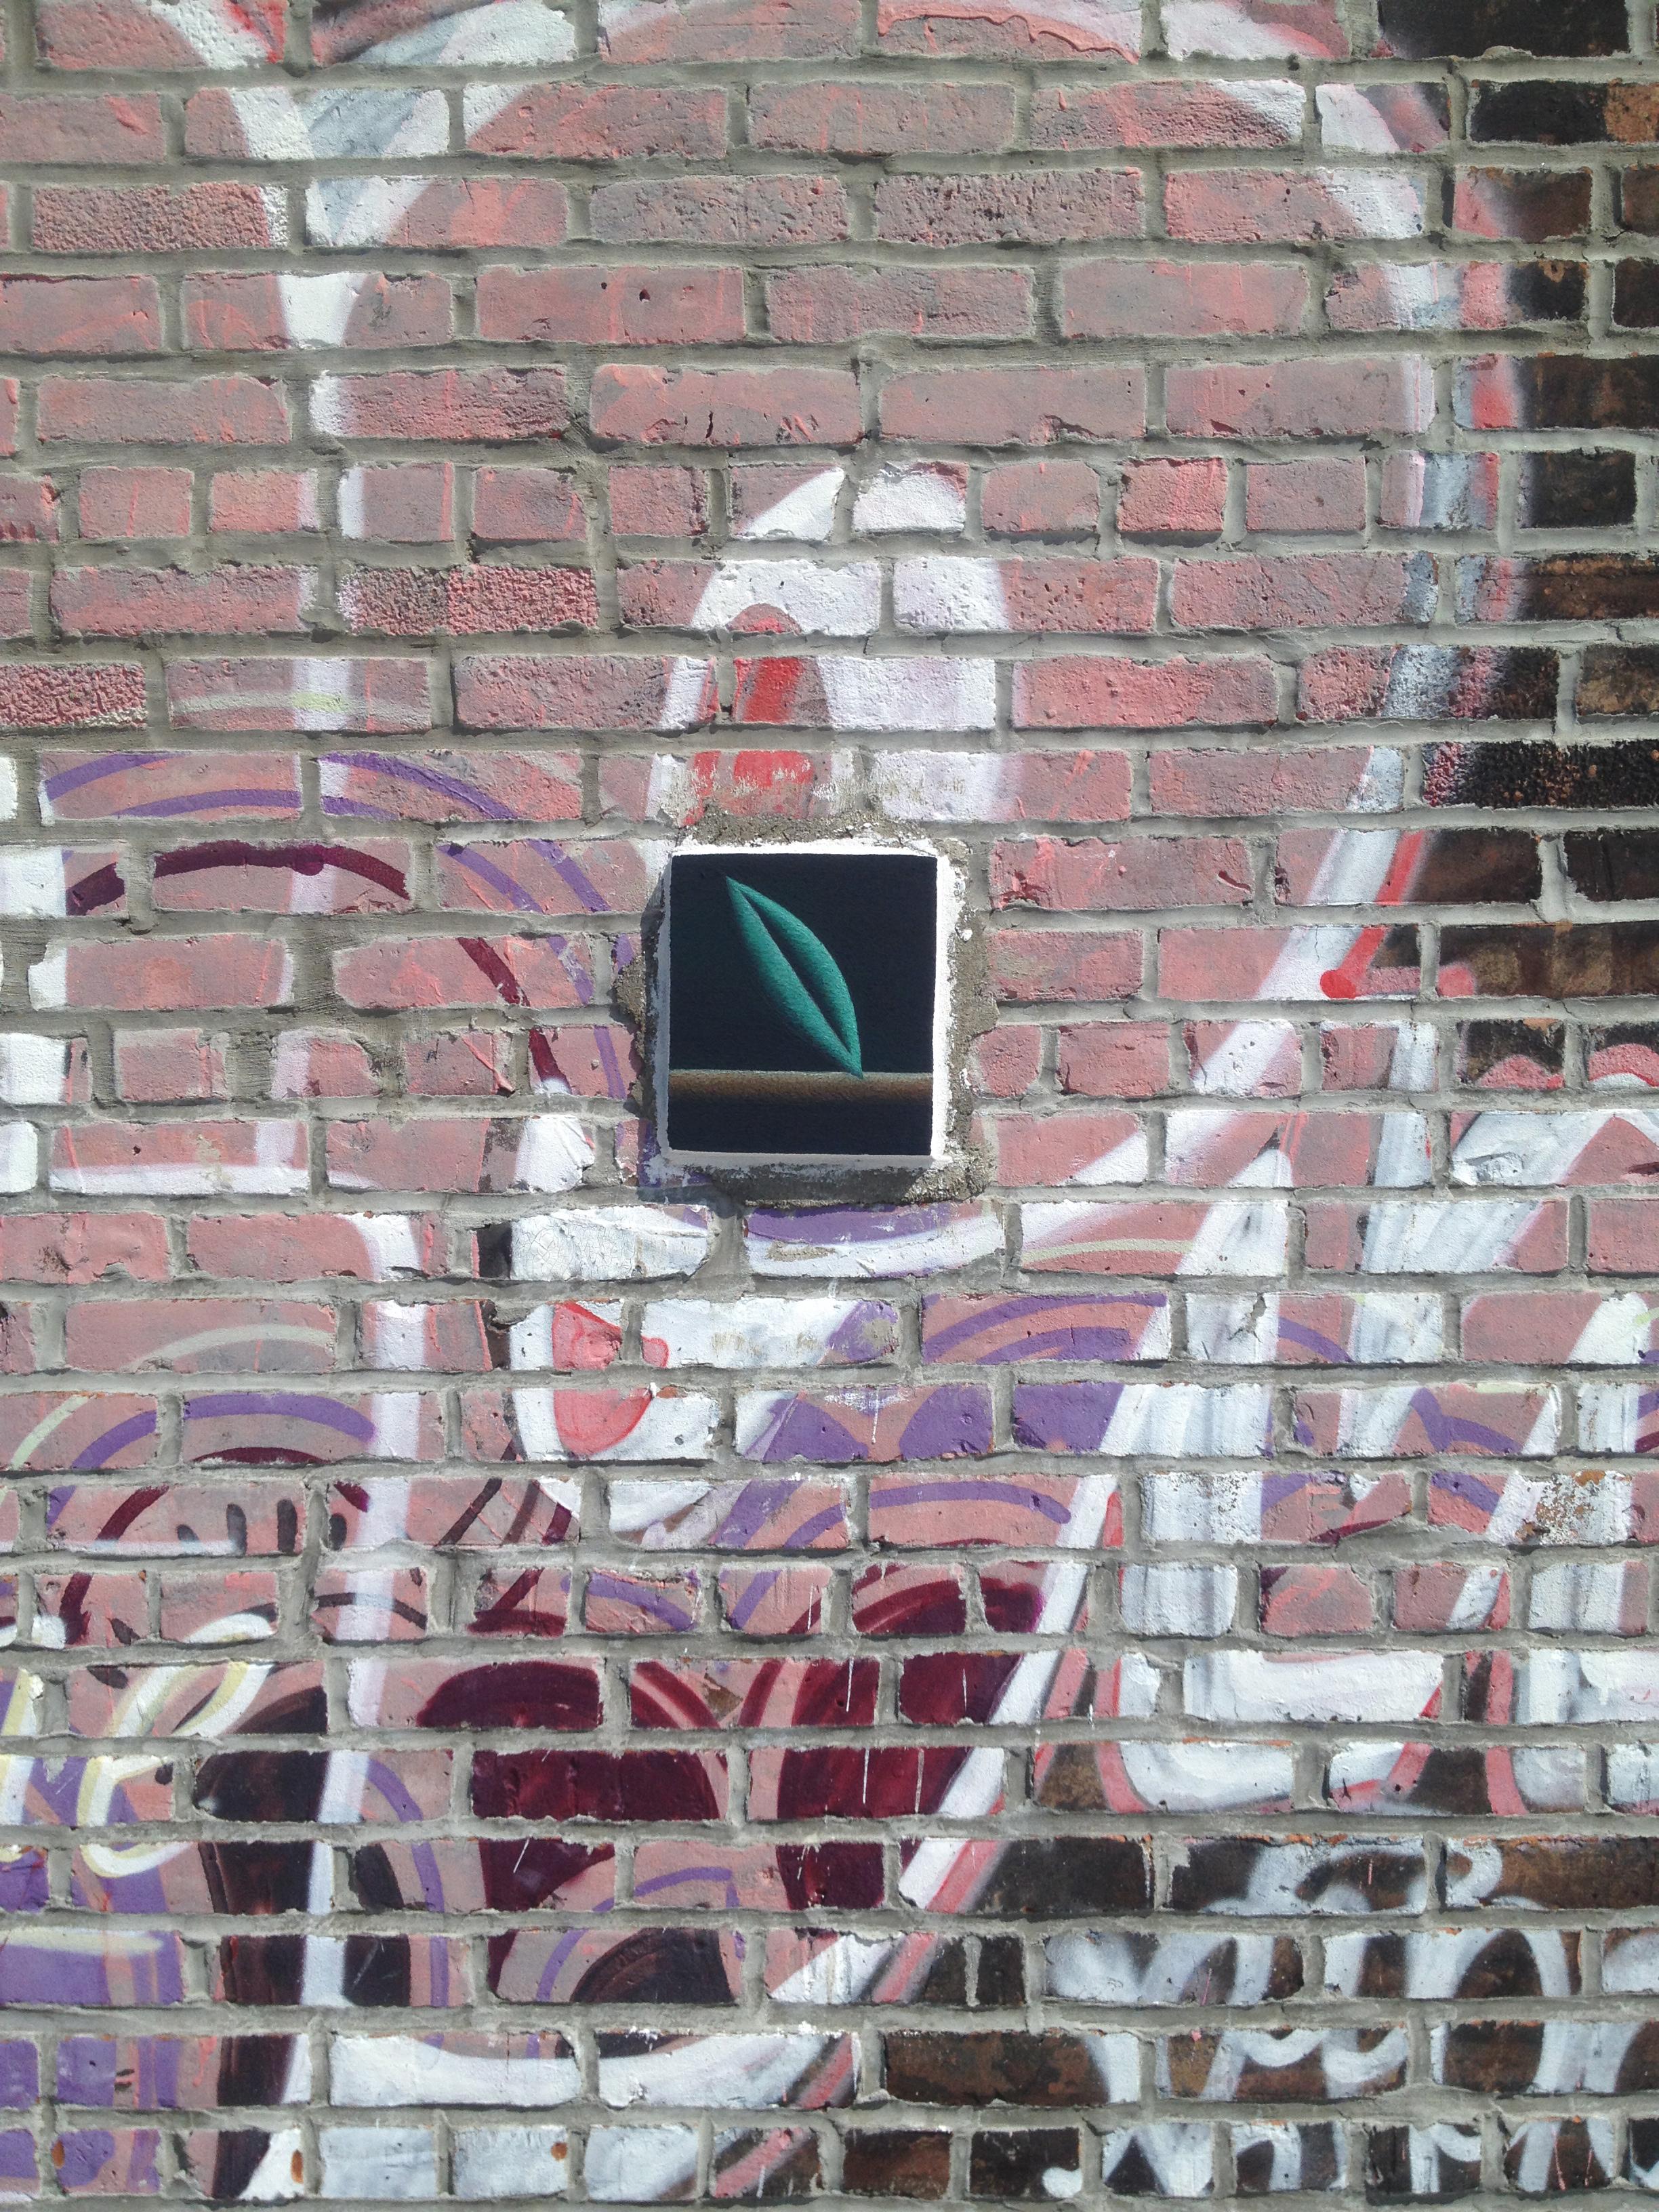 Nadia  Ayari  ,Out (Escape BFTS),2014, fresco and concrete on brick, approx 7h x 5w in / 17.8h x 12.7w cm, Brooklyn, New York